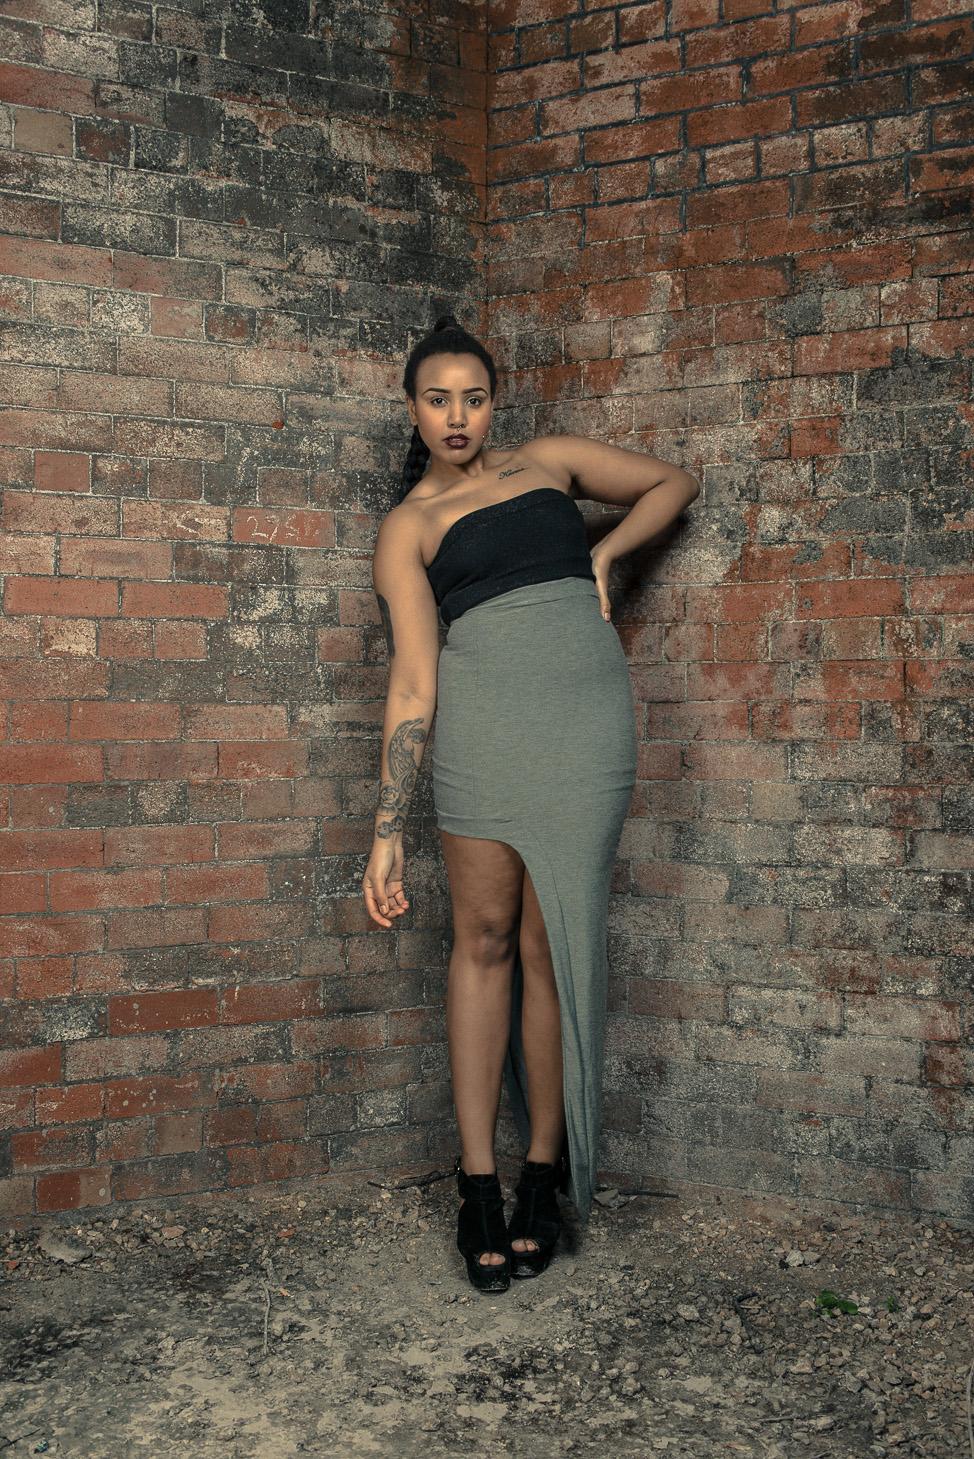 zaramia-ava-zaramiaava-leeds-fashion-designer-ethical-sustainable-tailored-minimalist-skirt-bandeau-maxi-versatile-drape-grey-bodysuit-black-obi-belt-wrap-cowl-styling-womenswear-models-photoshoot-30